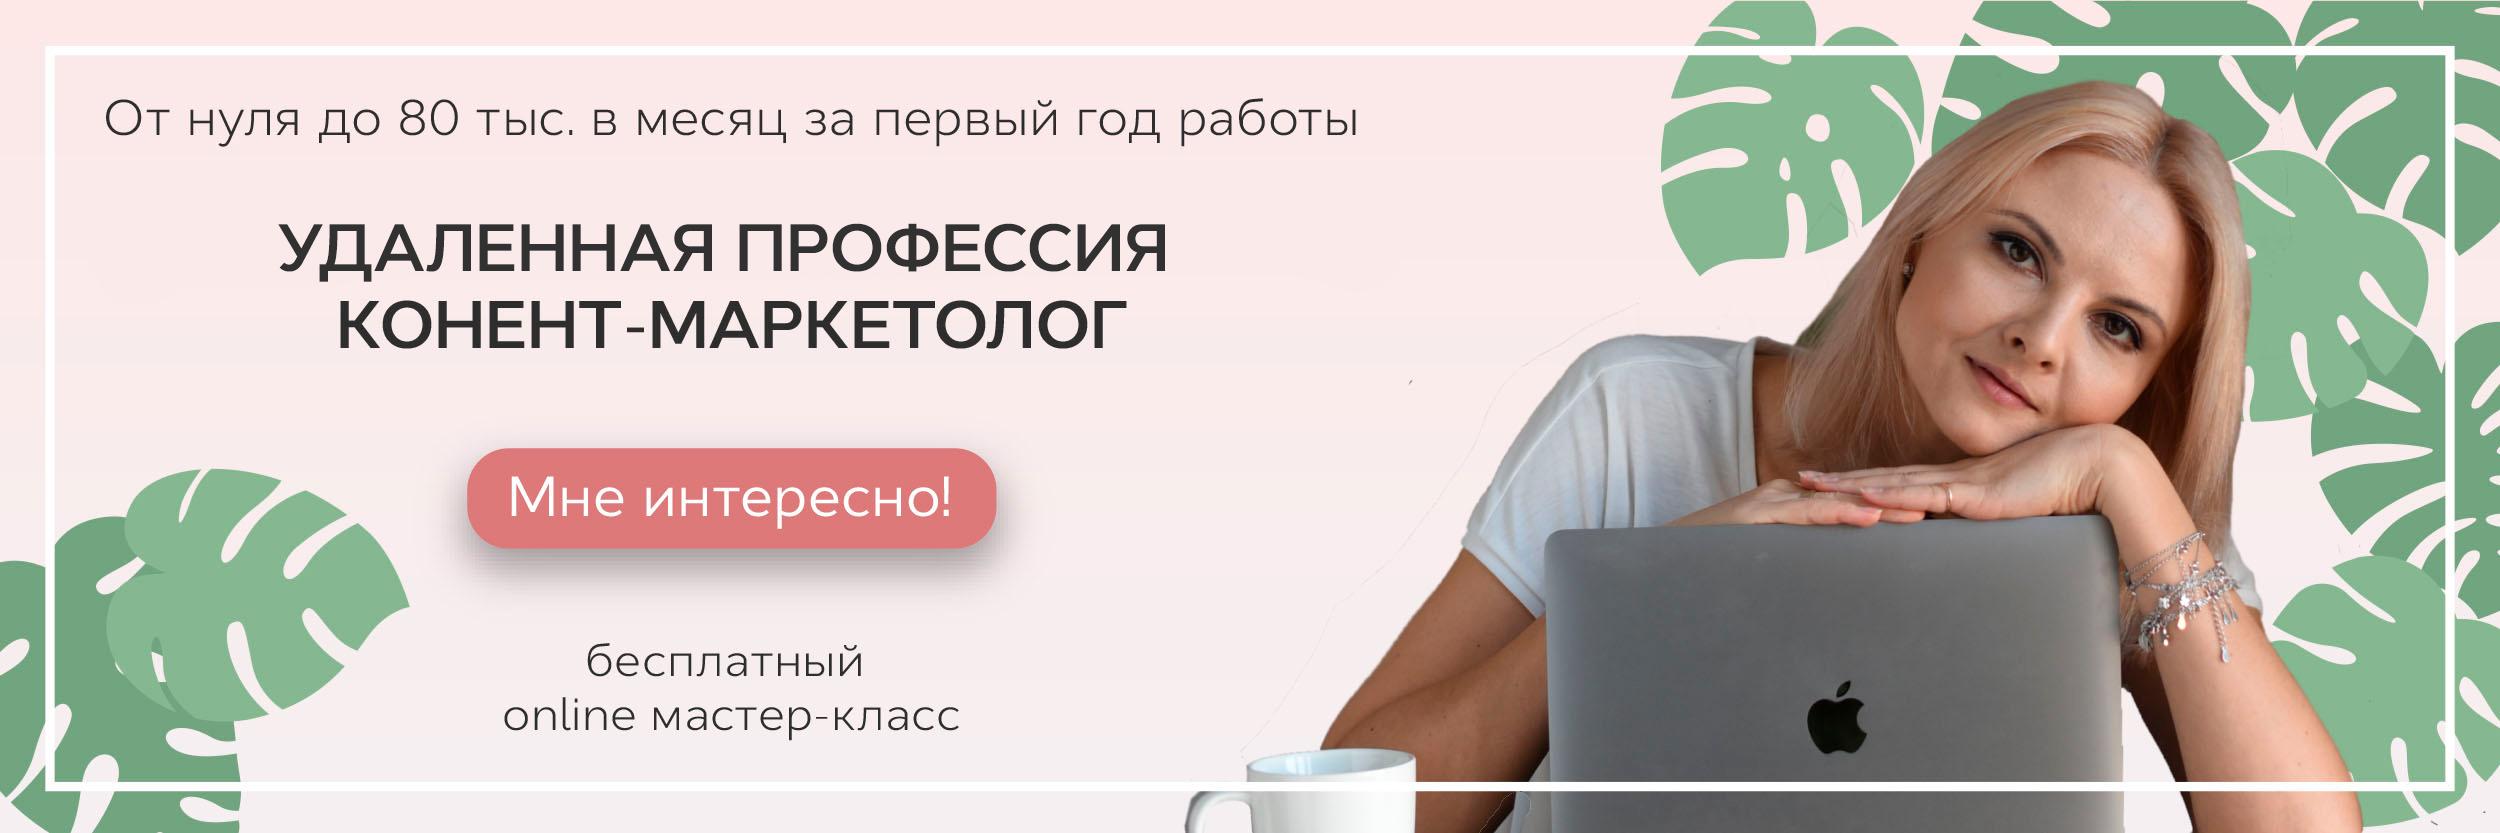 Онлайн профессия маркетолога